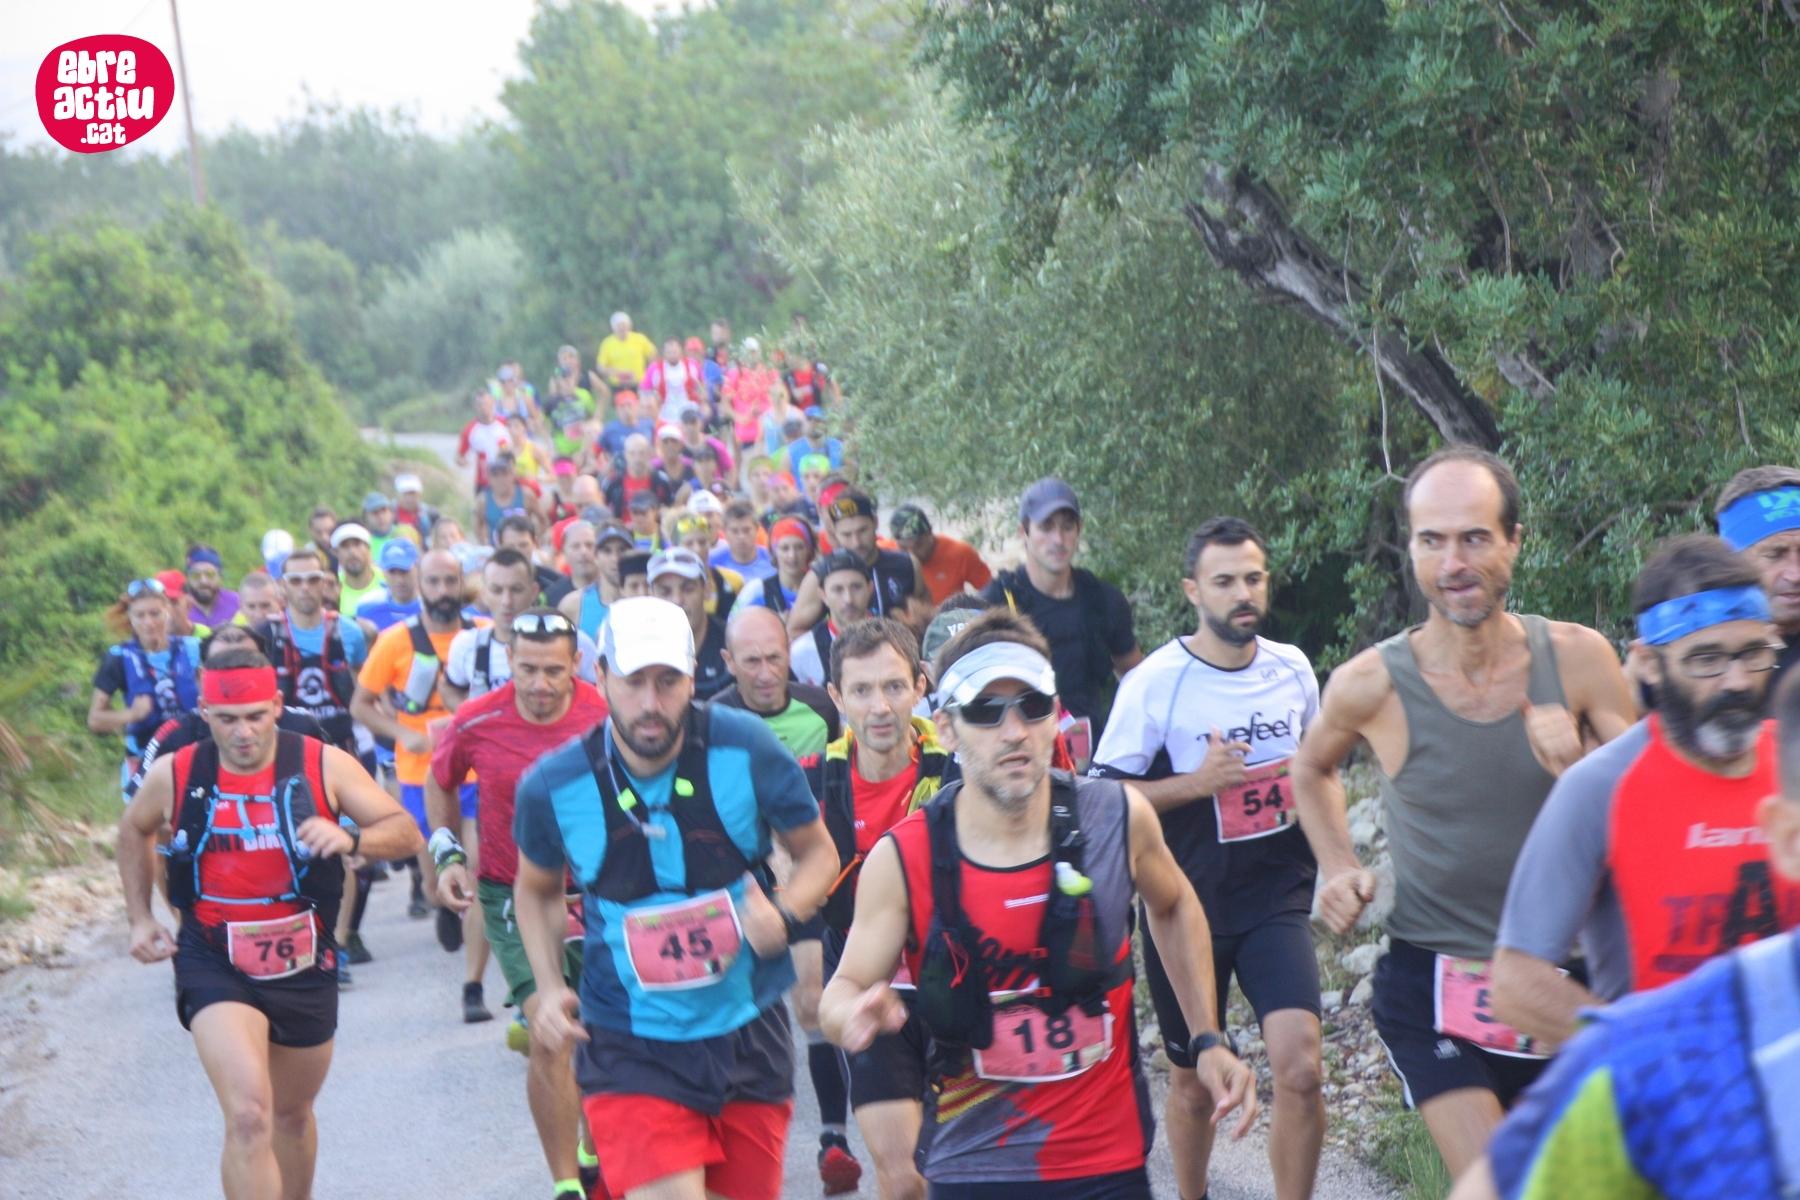 Fotos de la 13a Pujada al Montsià (Alcanar, 29/9/2019)